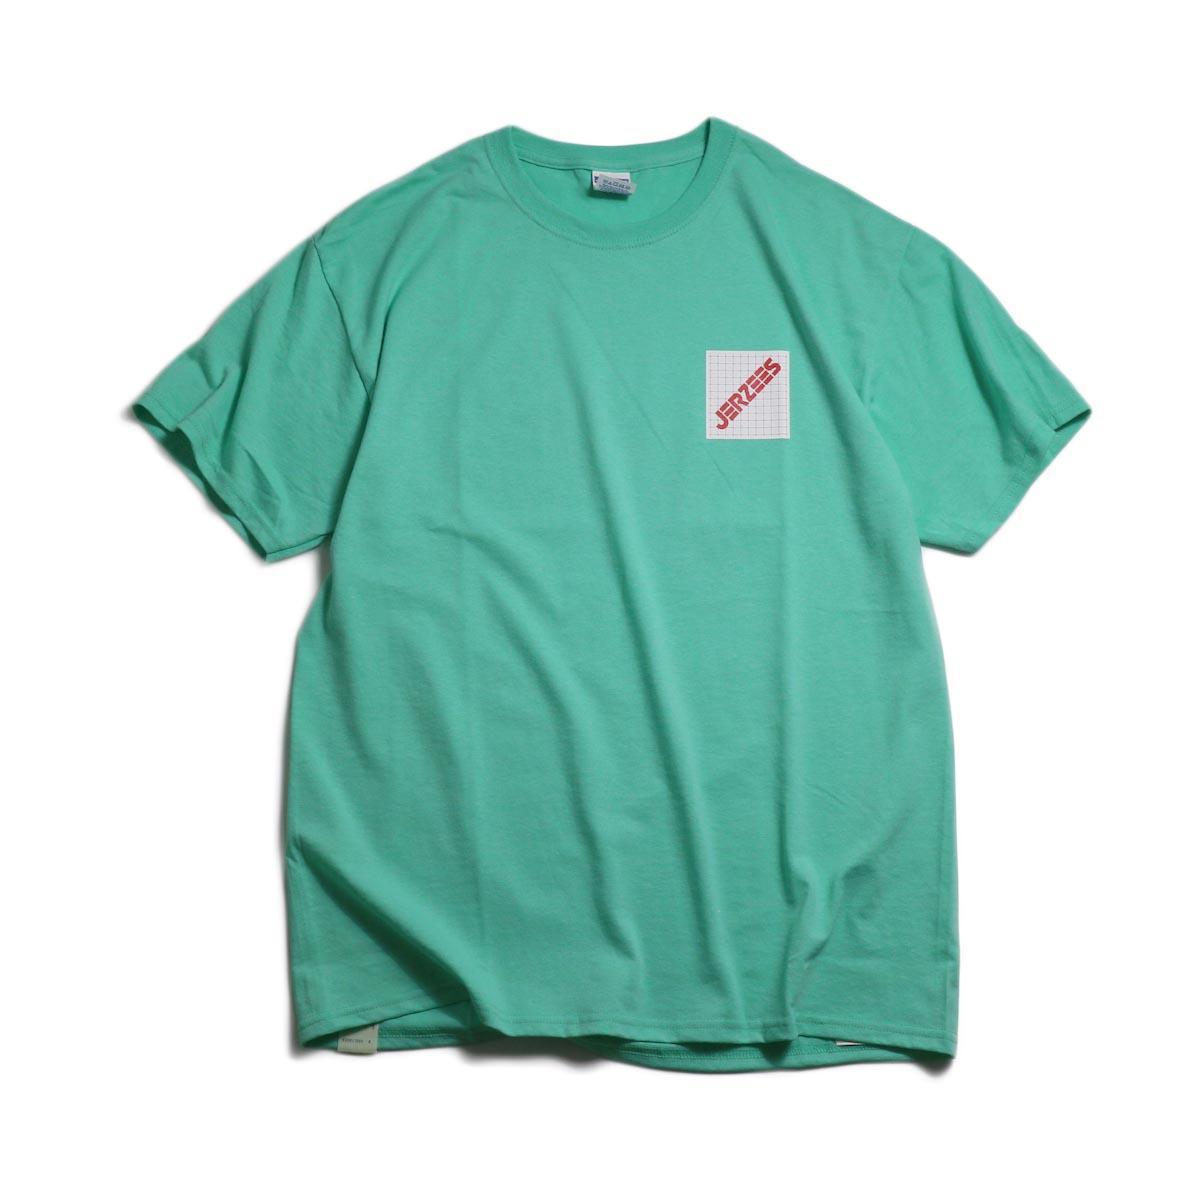 N.HOOLYWOOD × JERZEES  / 191-CS44-070 Short Sleeve Tee -Mint 正面